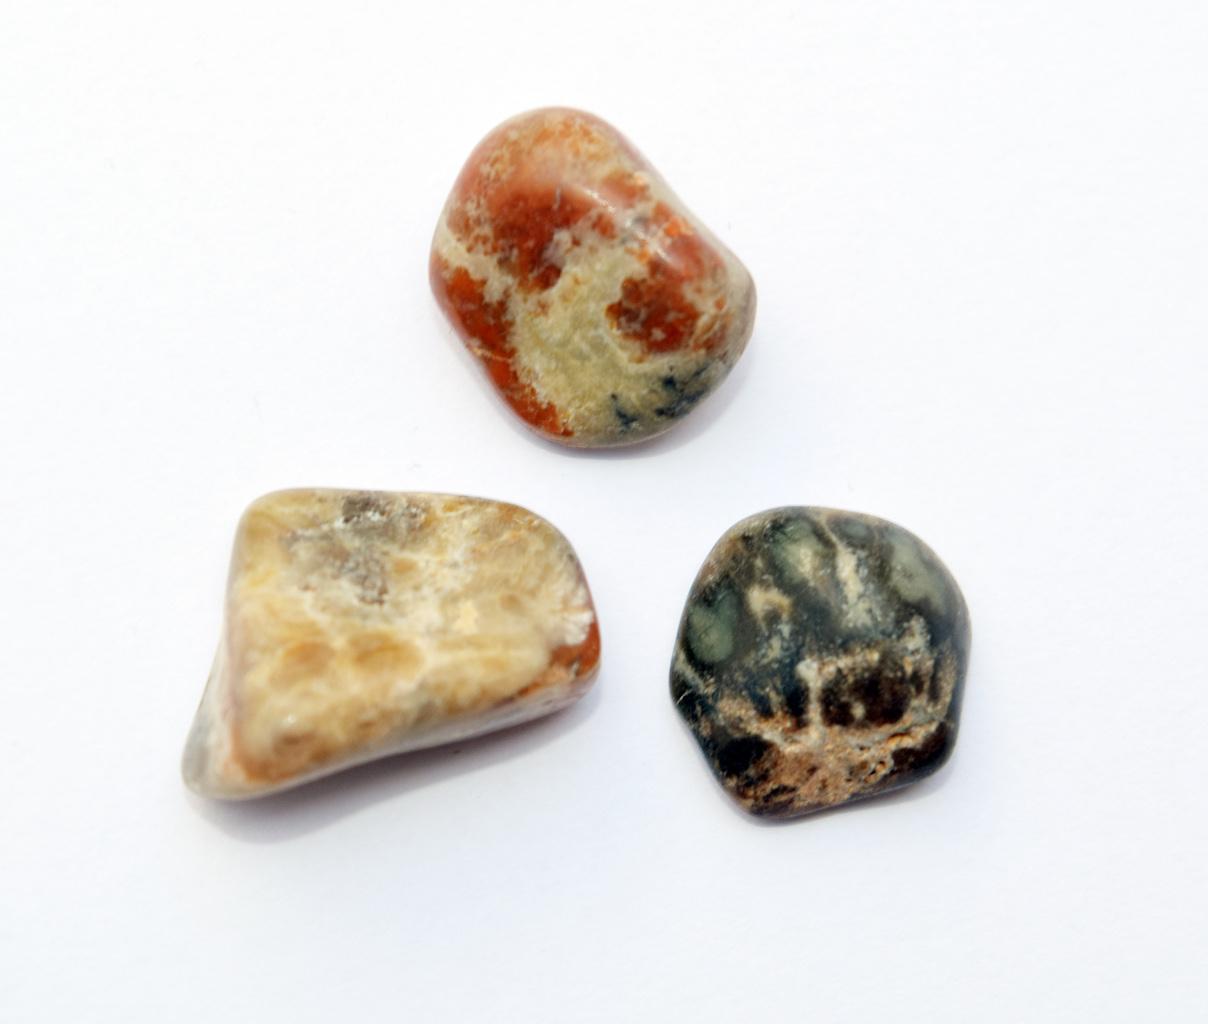 peices_fossilized_dinosaur_poo_coprolite_jurassic_jacks